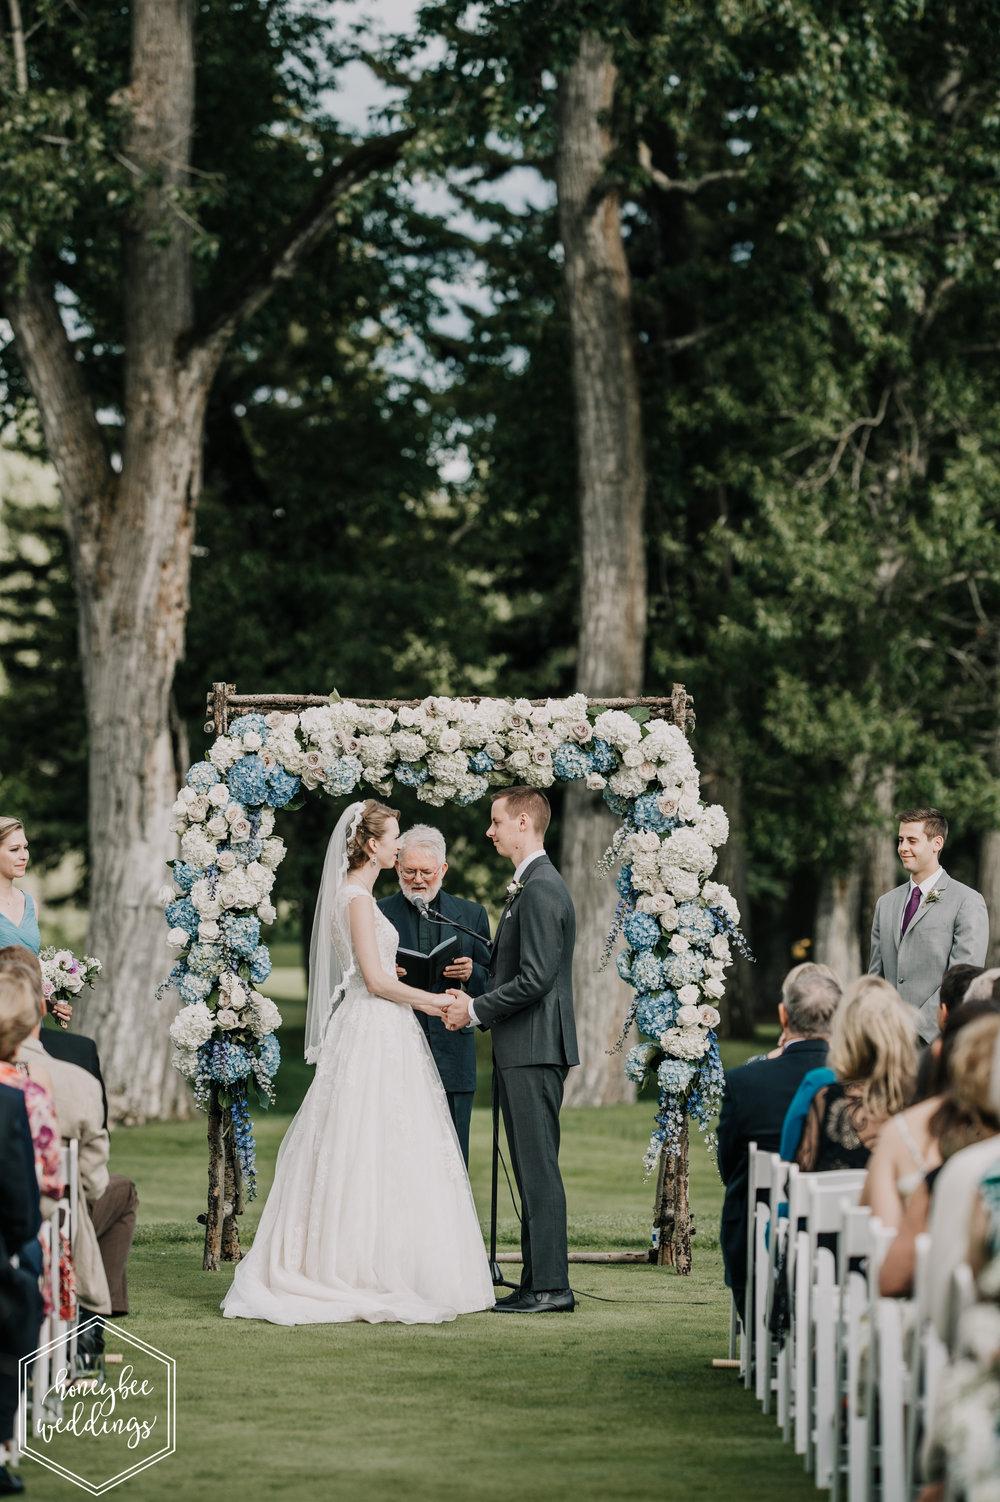 564 Riverside Country Club Wedding_Montana Wedding Photographer_Lauren Jackson + Evan Ivaldi 2018-6682.jpg